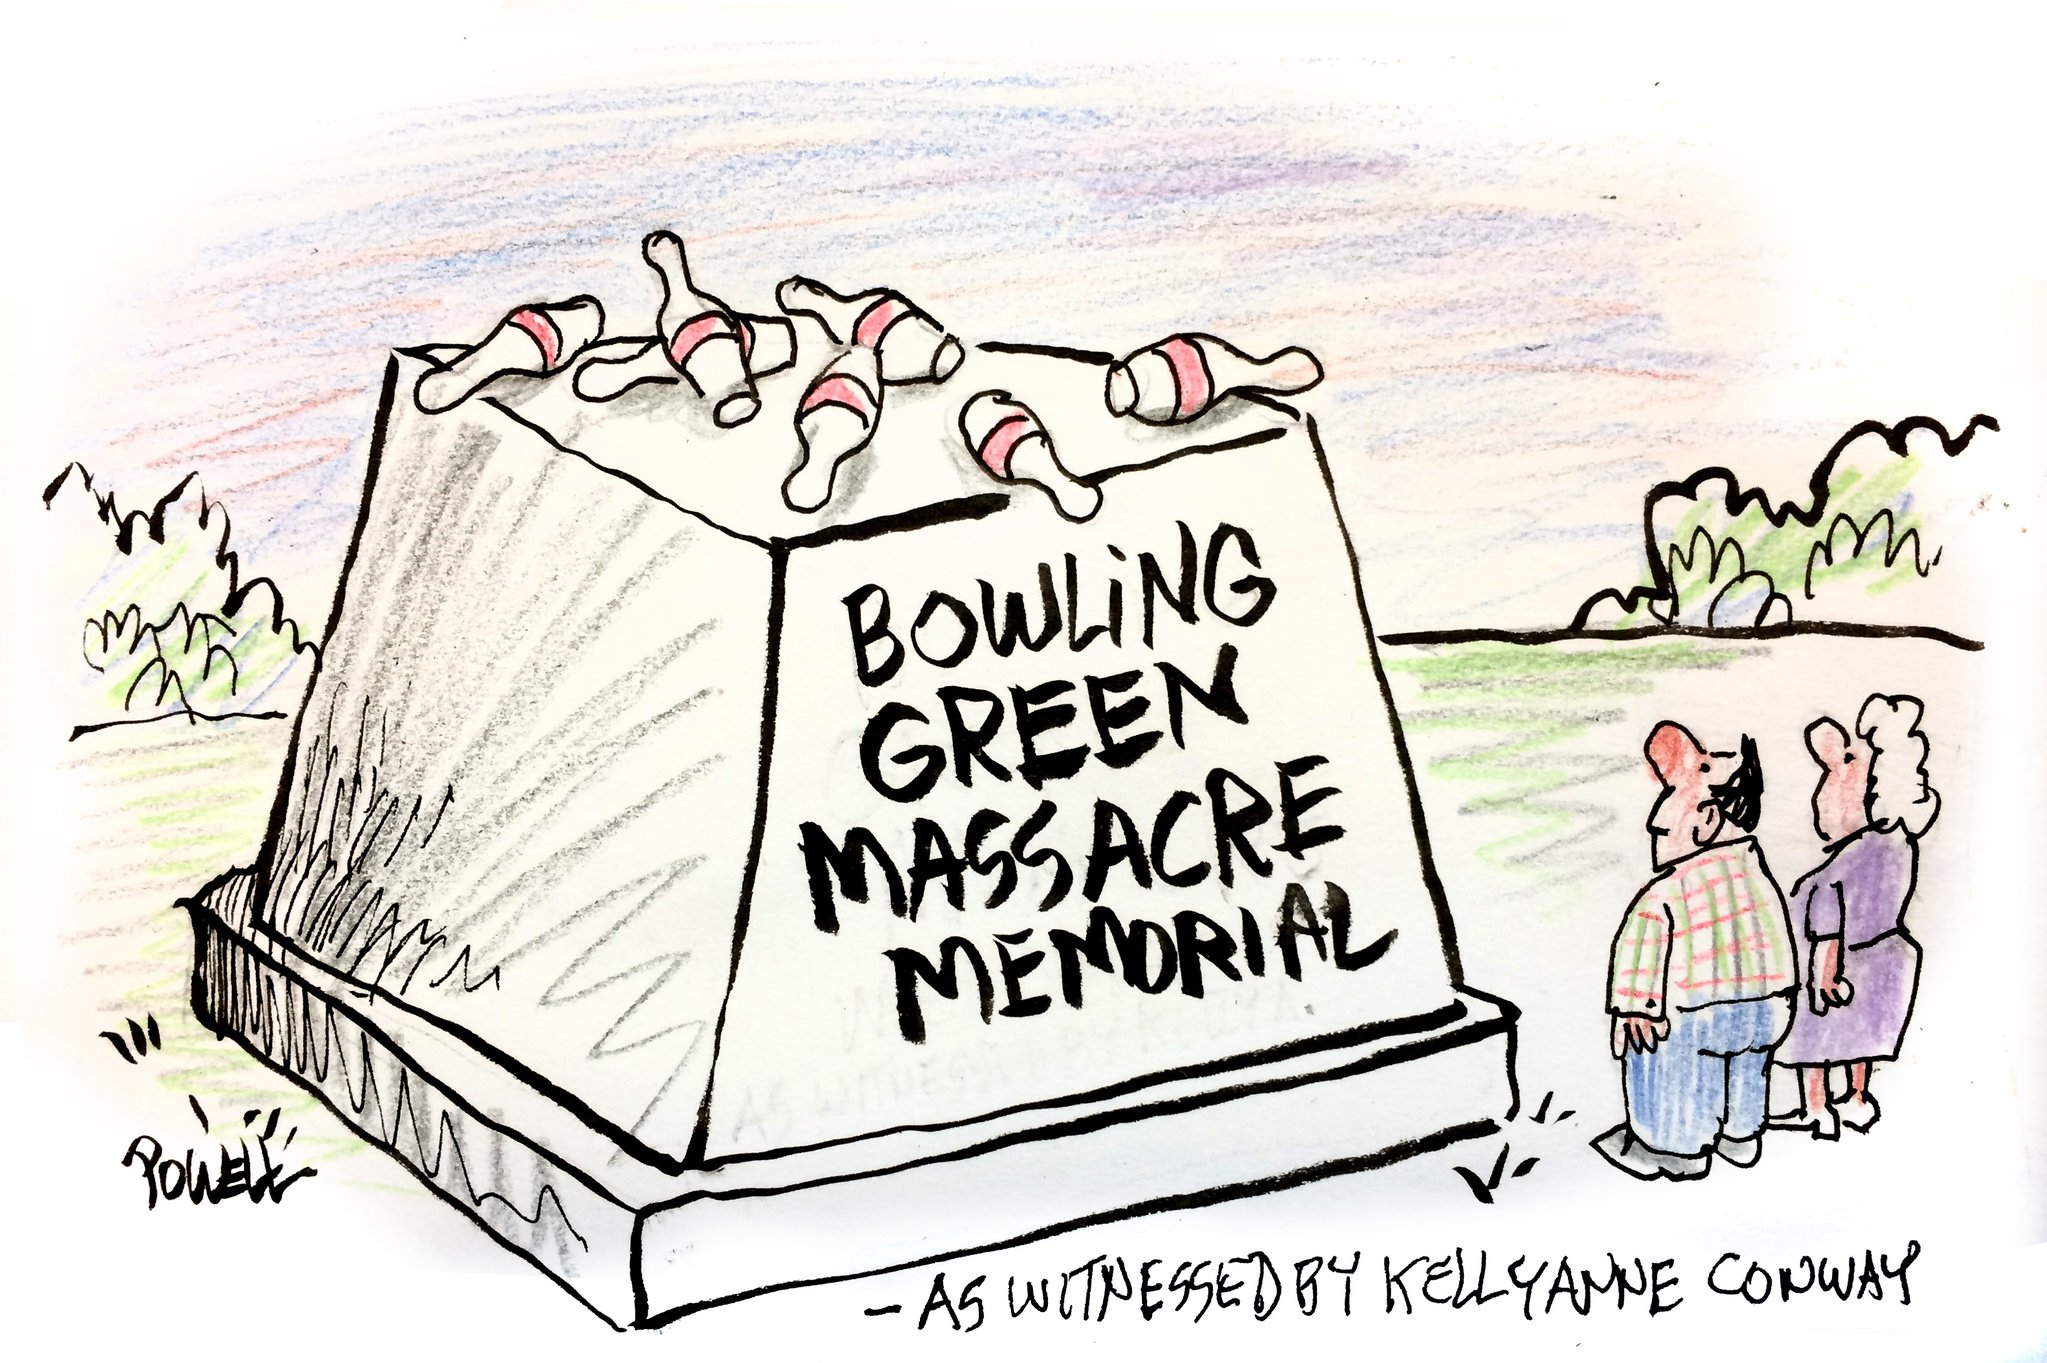 bowling green memorial